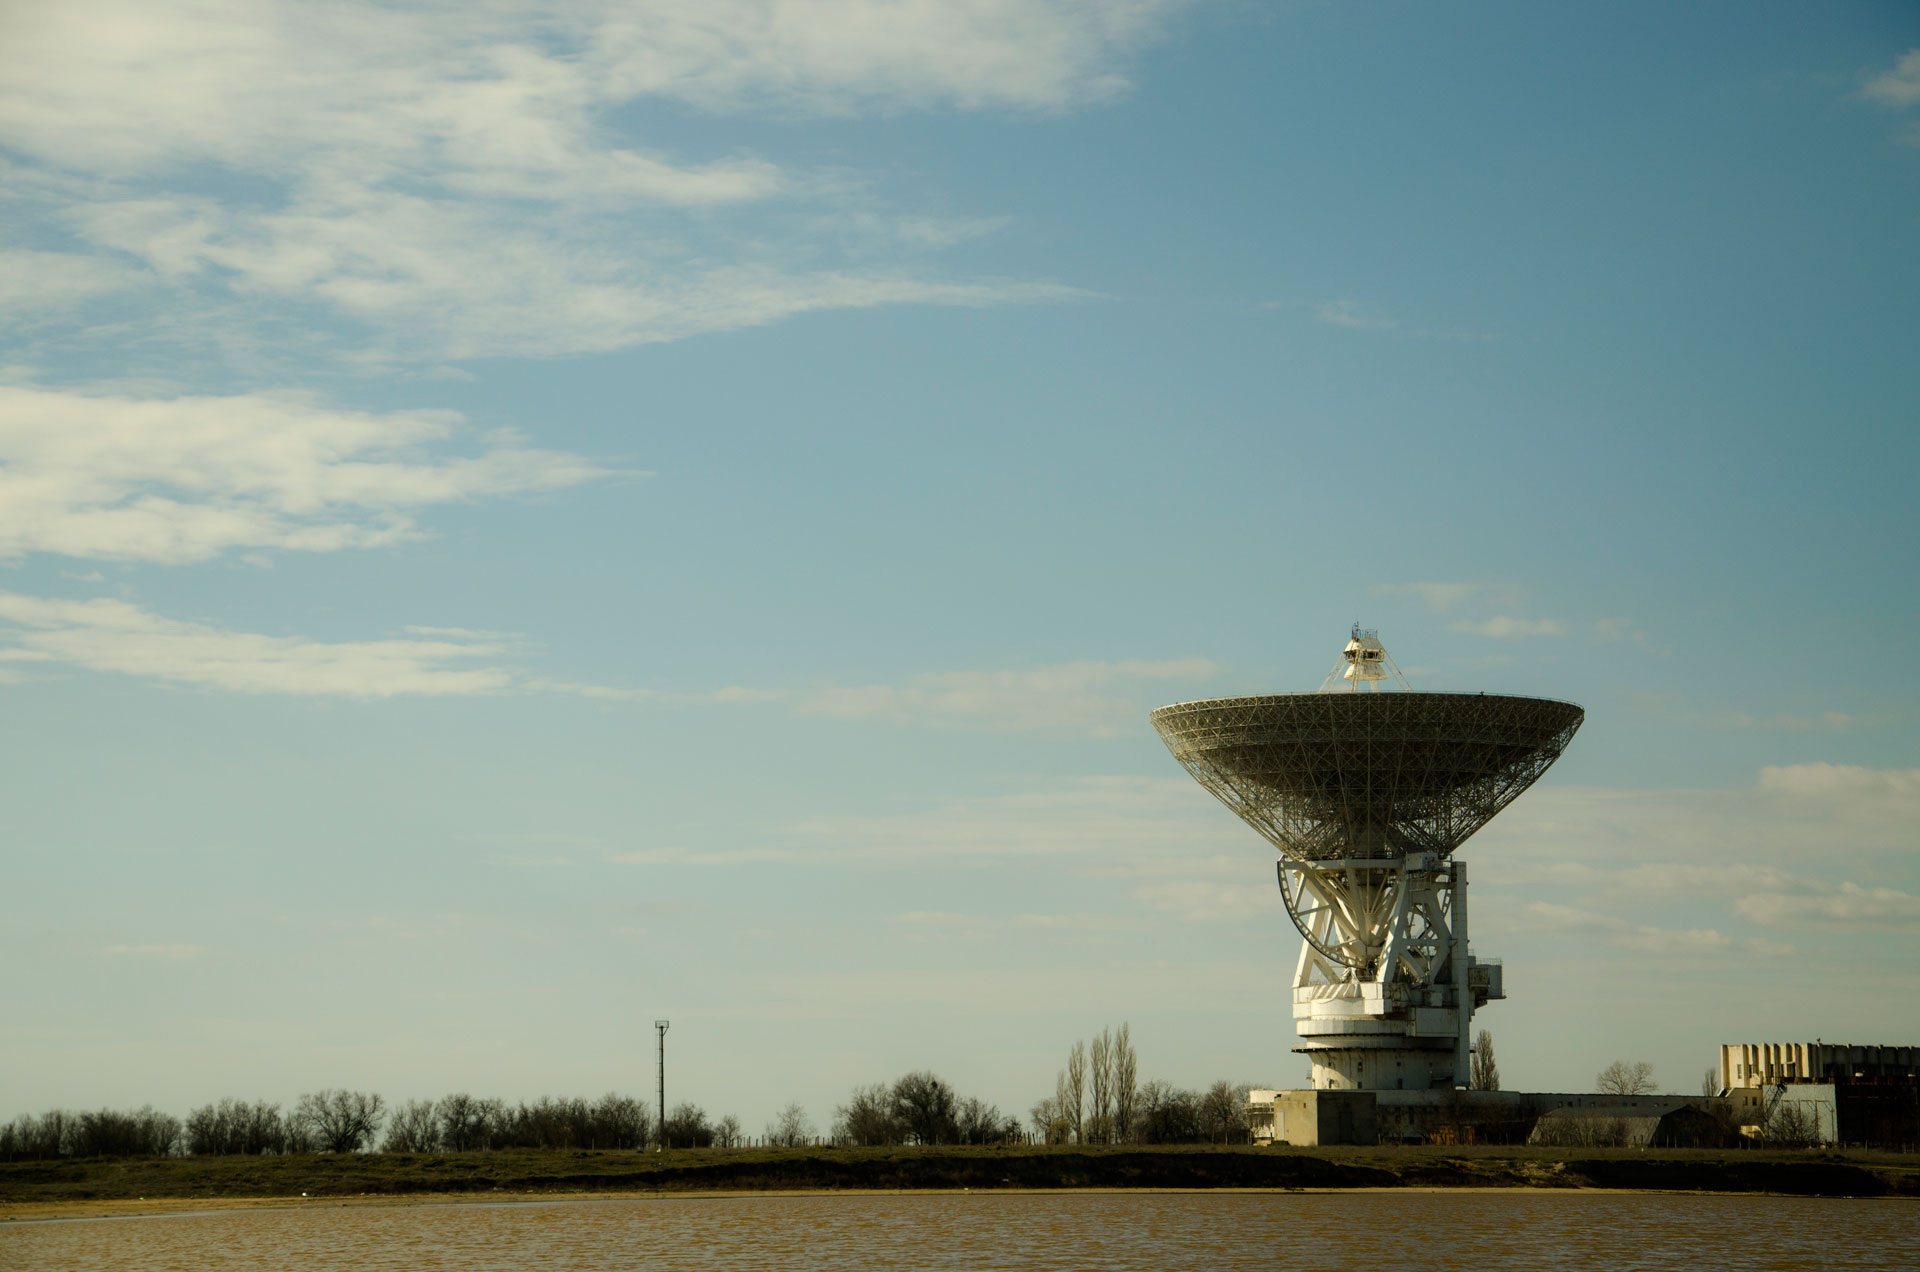 Радиотелескоп РТ-70. Фото Молочного